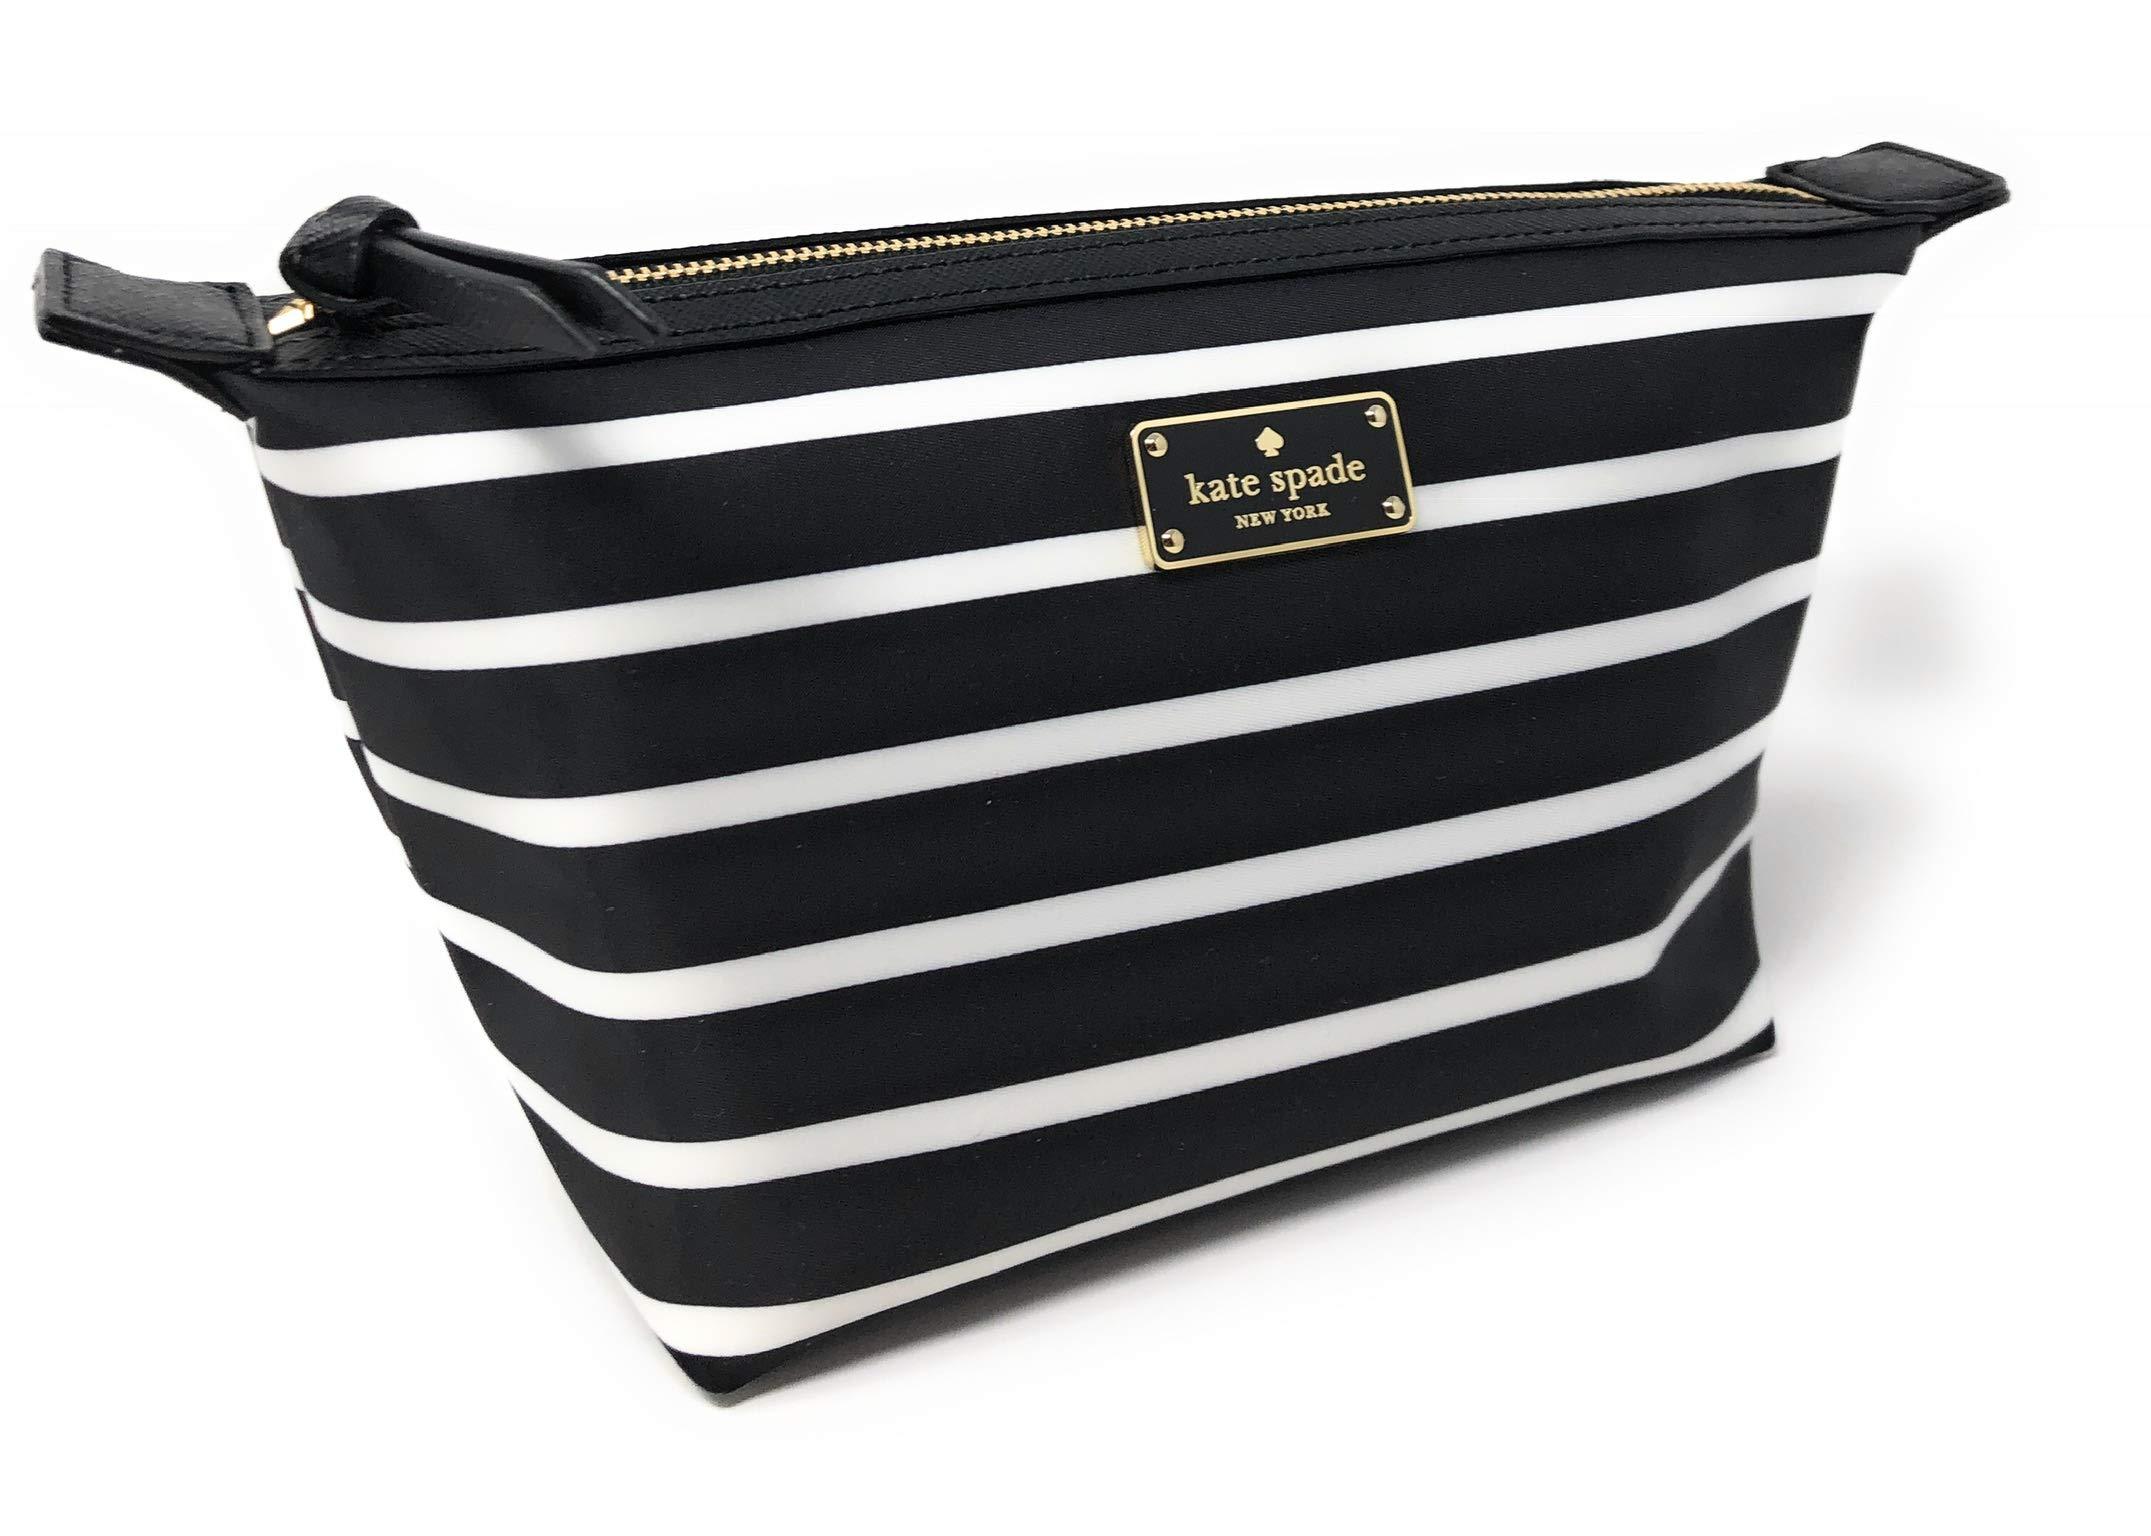 Kate Sapde New York Jodi Large Cosmetics Make-Up Clutch Bag Black